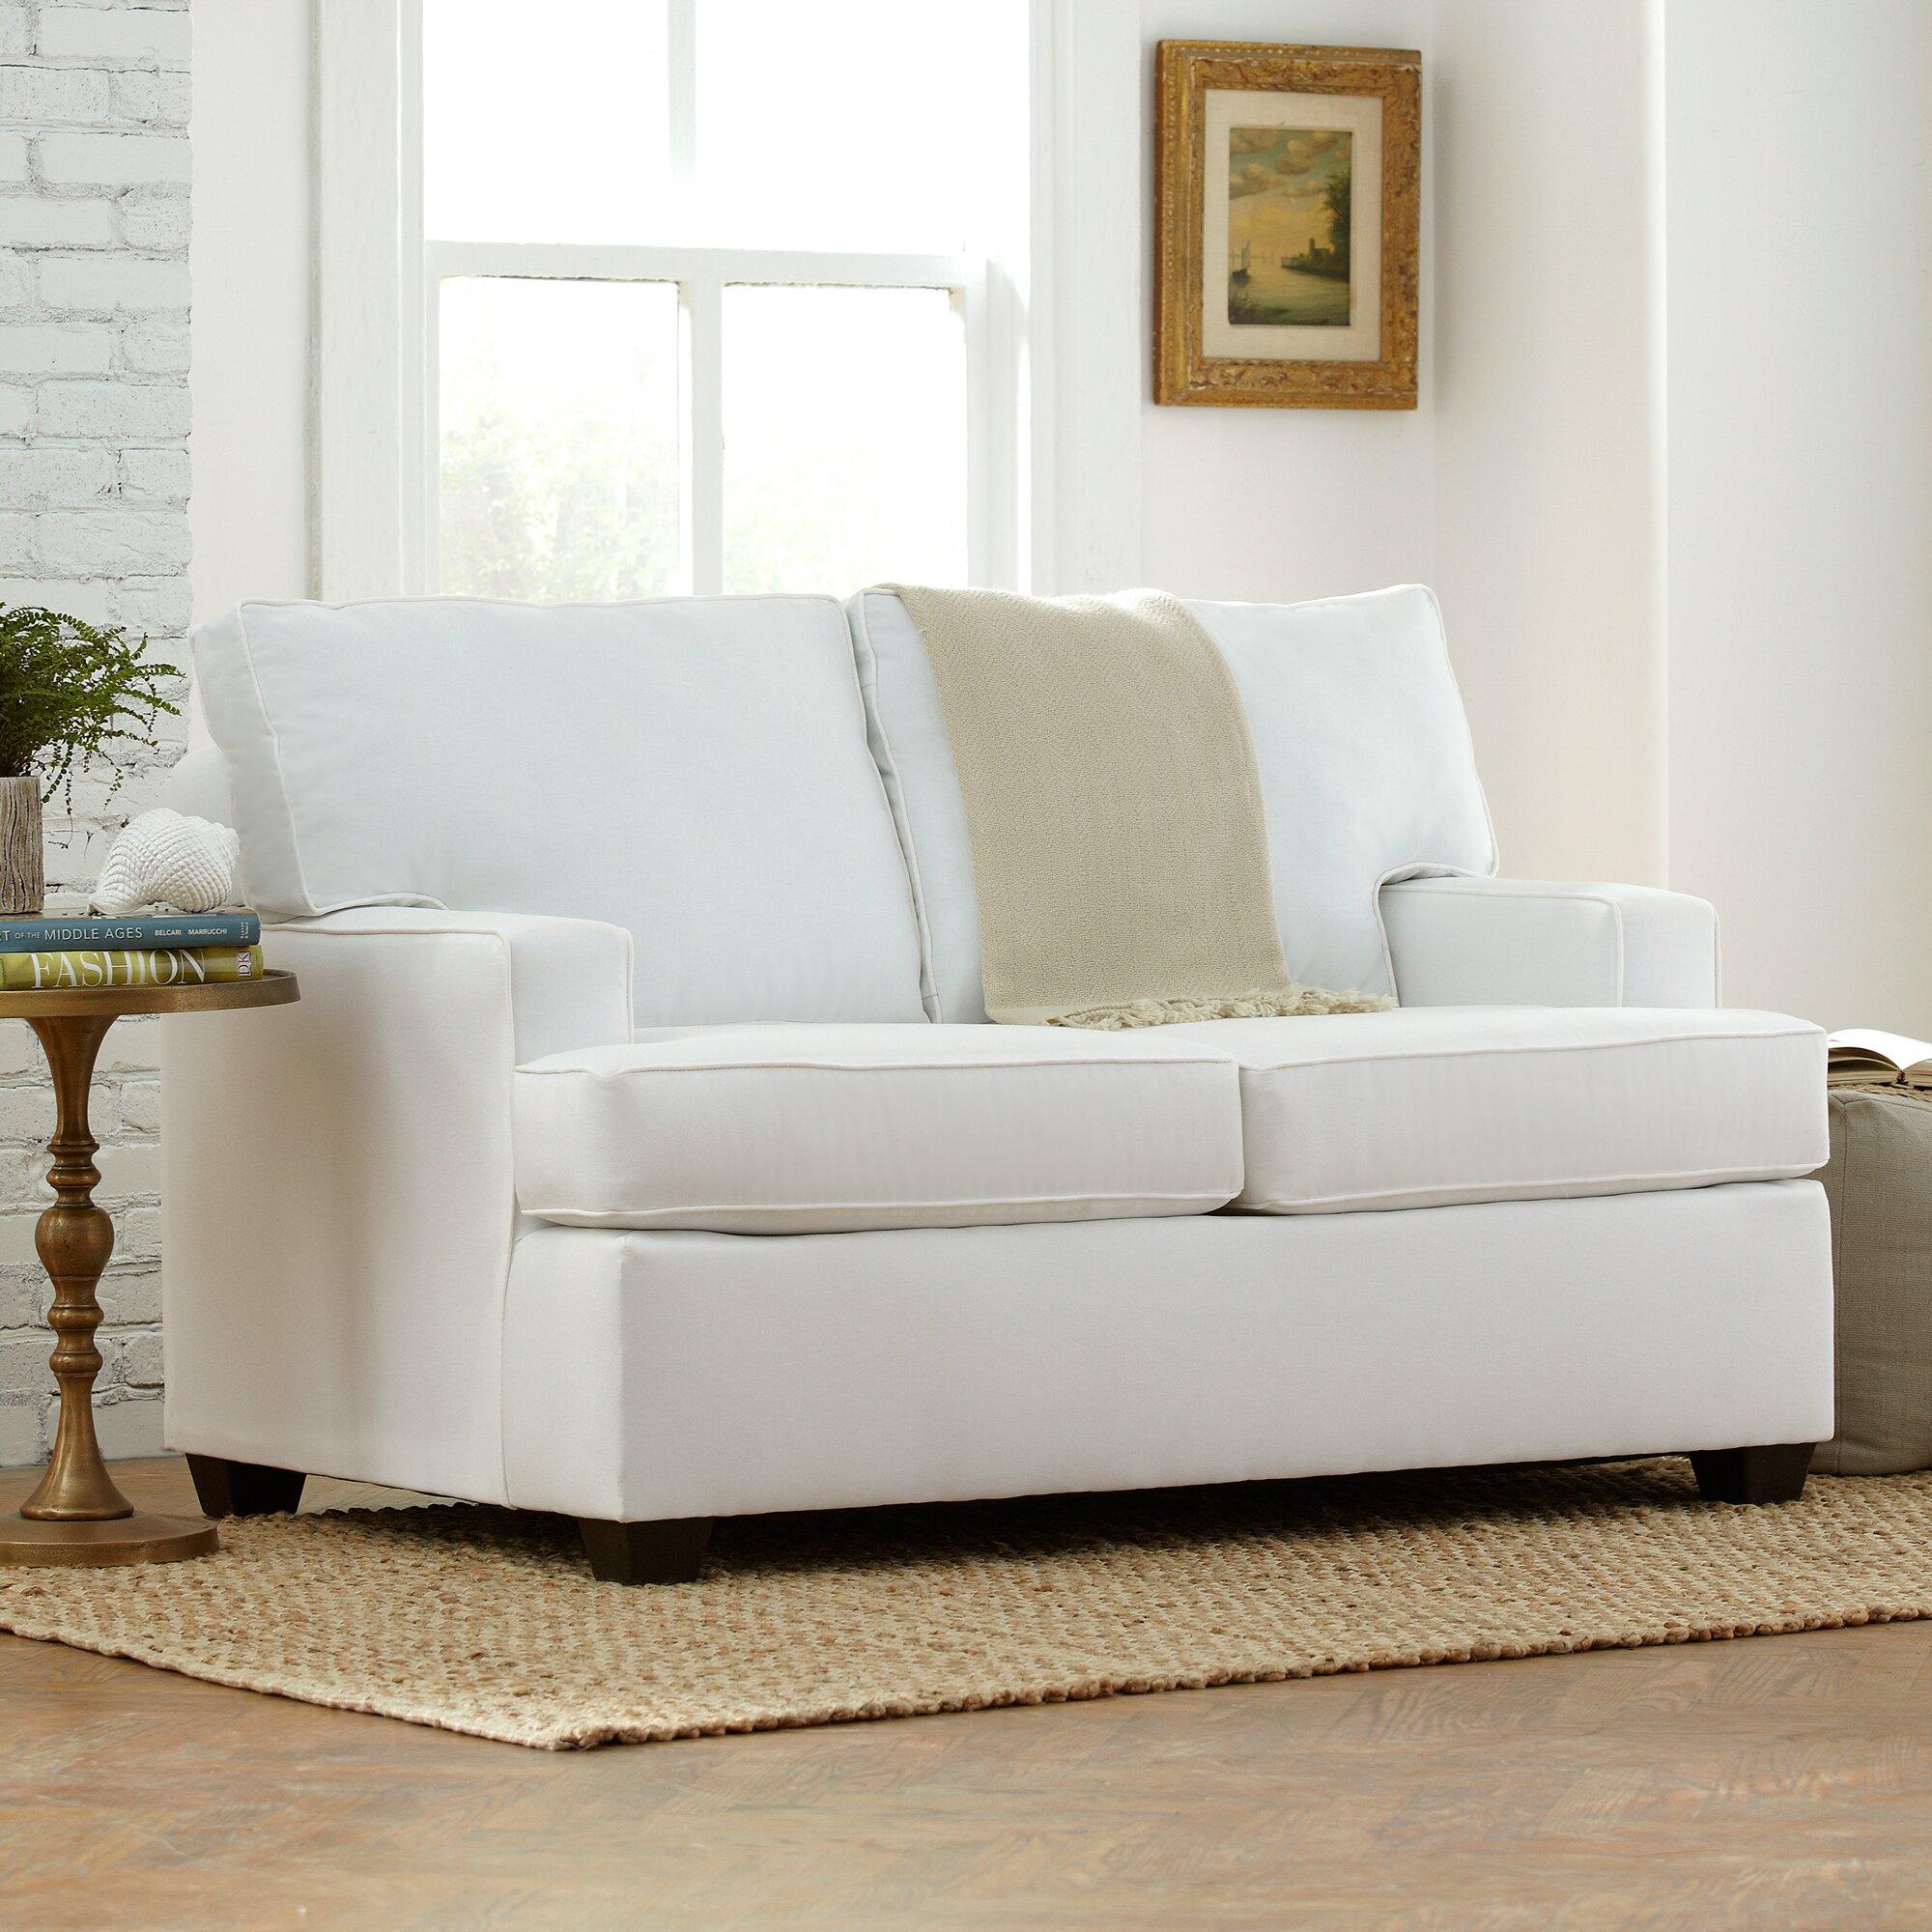 Astonishing Lane Sofas And Loveseats Grey Sofa Living Room Ideas Pdpeps Interior Chair Design Pdpepsorg